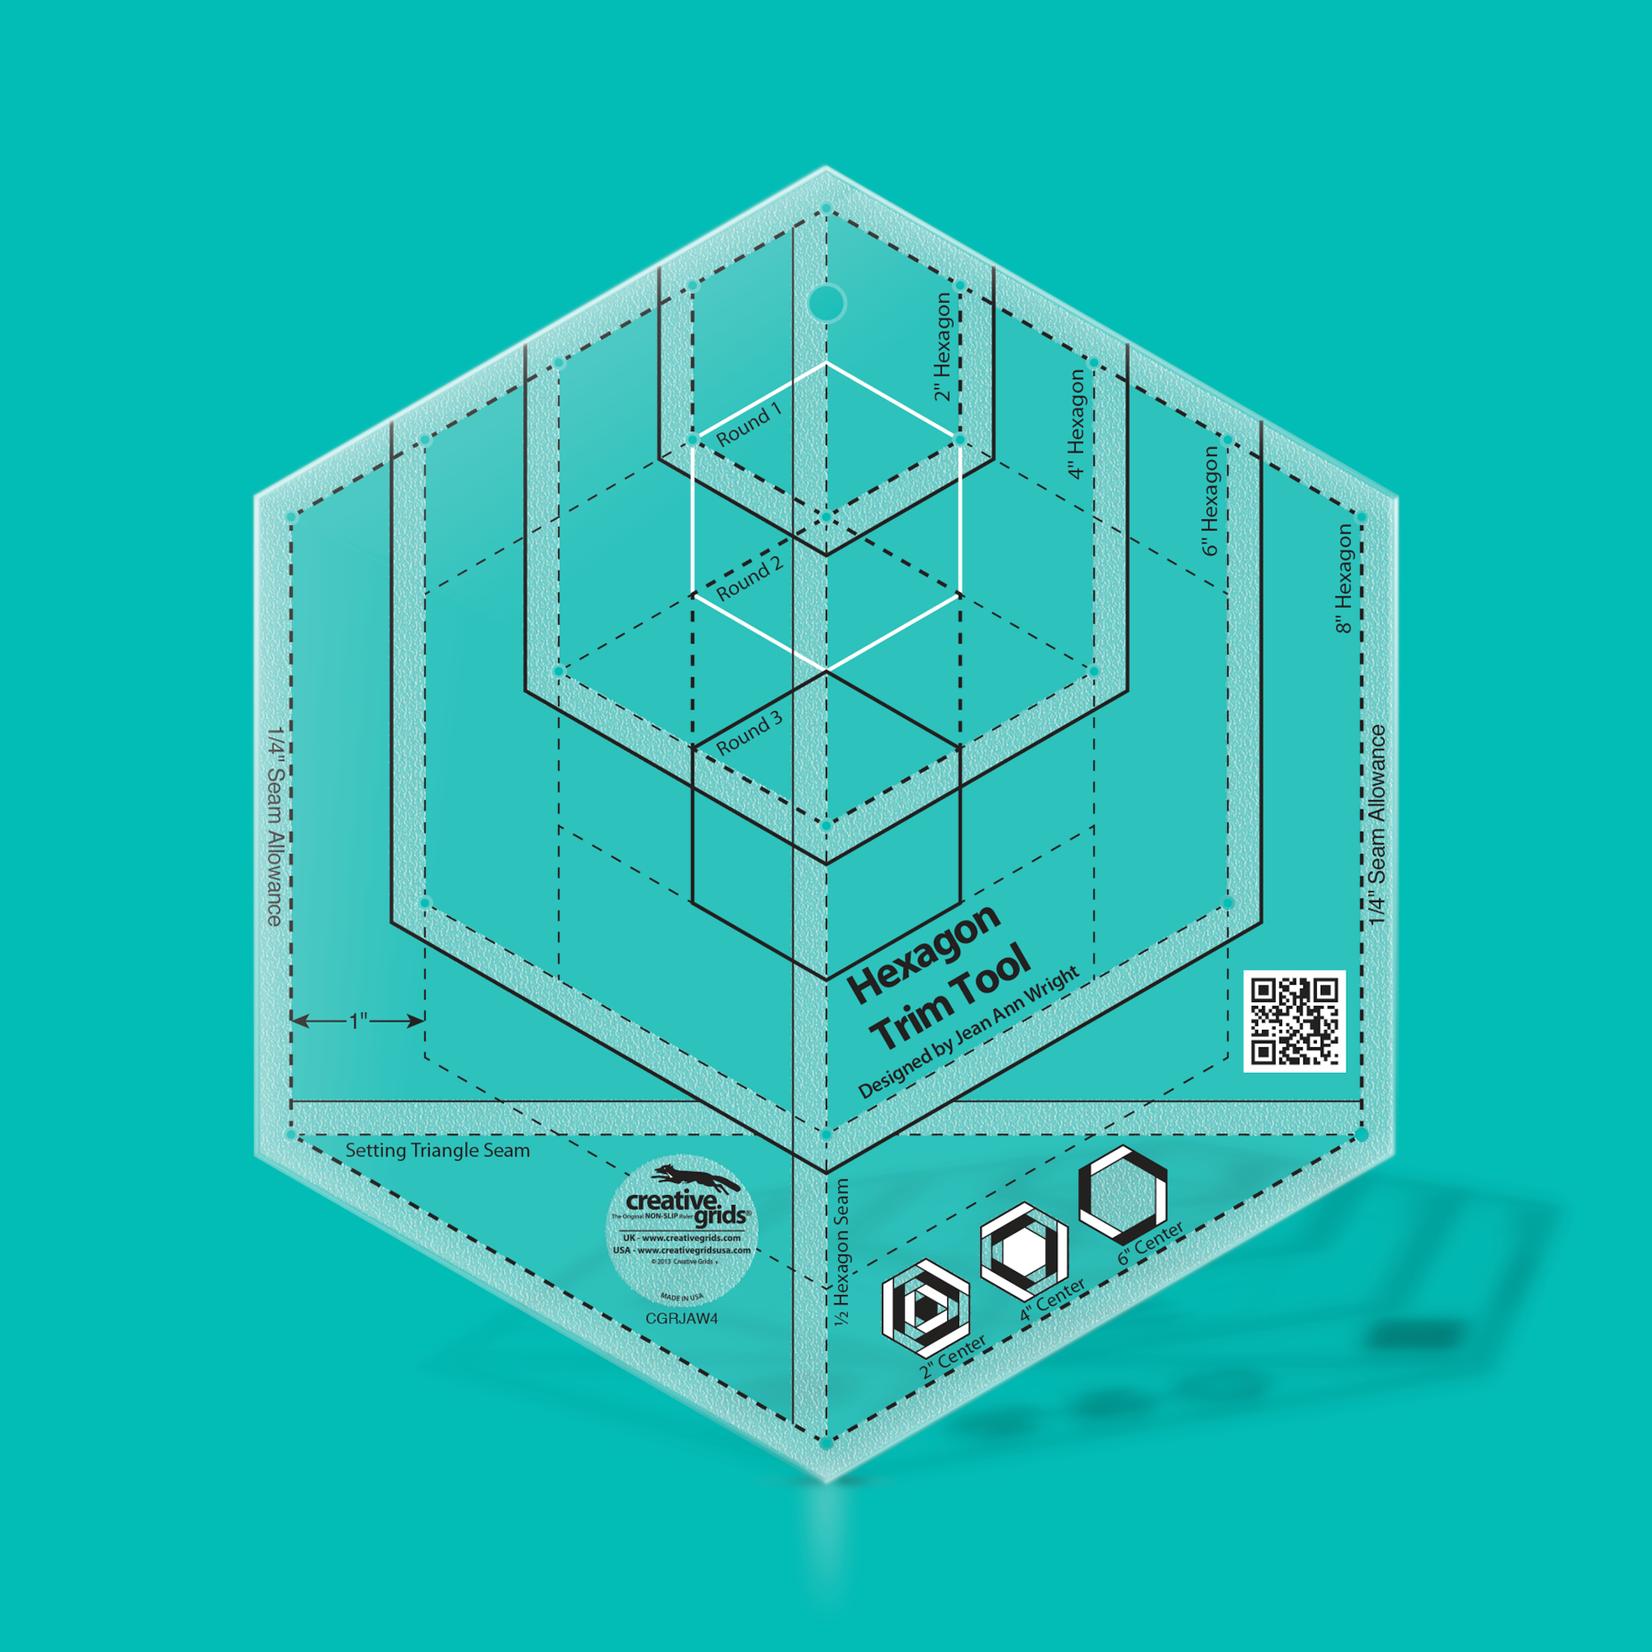 Creative Grids Creative Grids Hexagon Trim Tool CGRJAW4